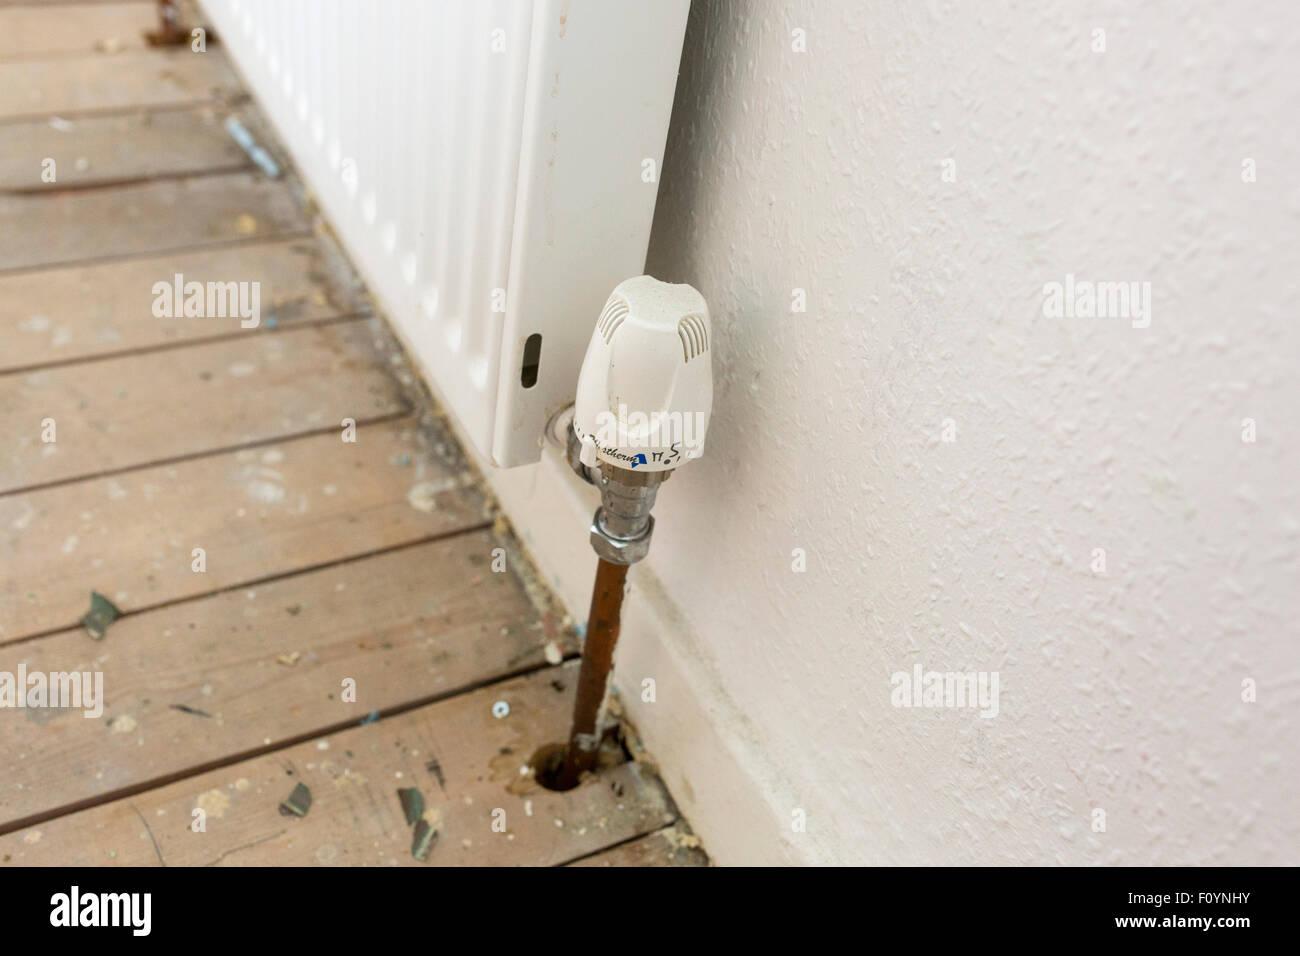 radiator control valve - Stock Image